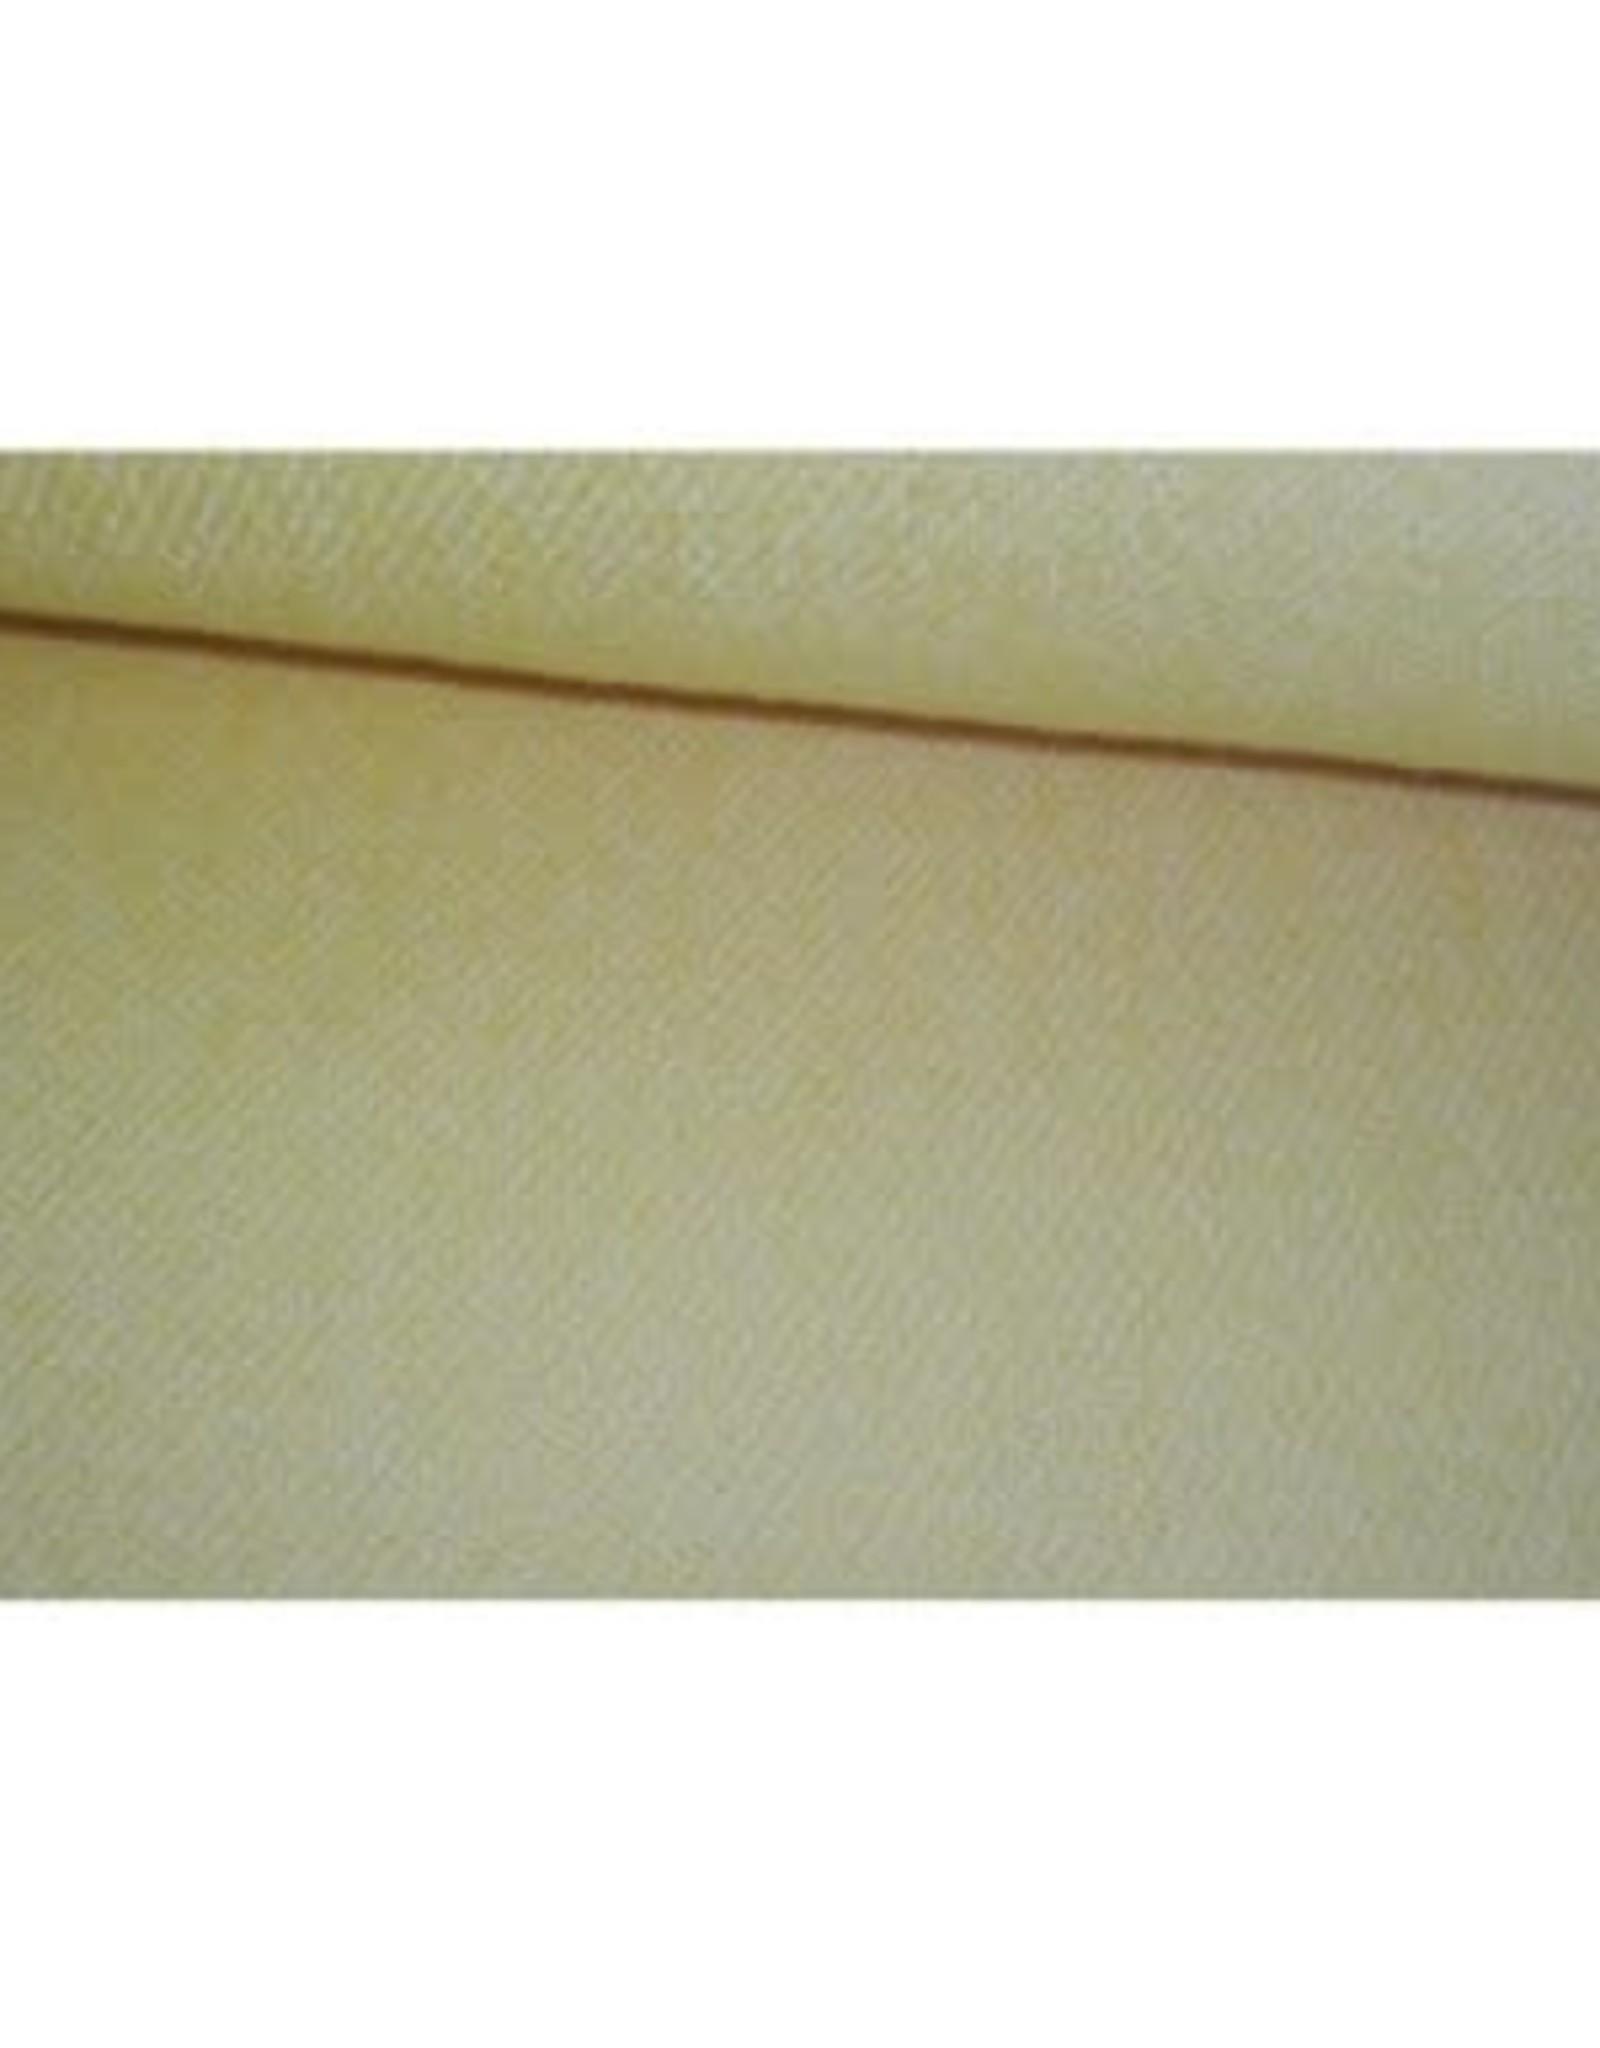 Jeans Geel 148. cm breed